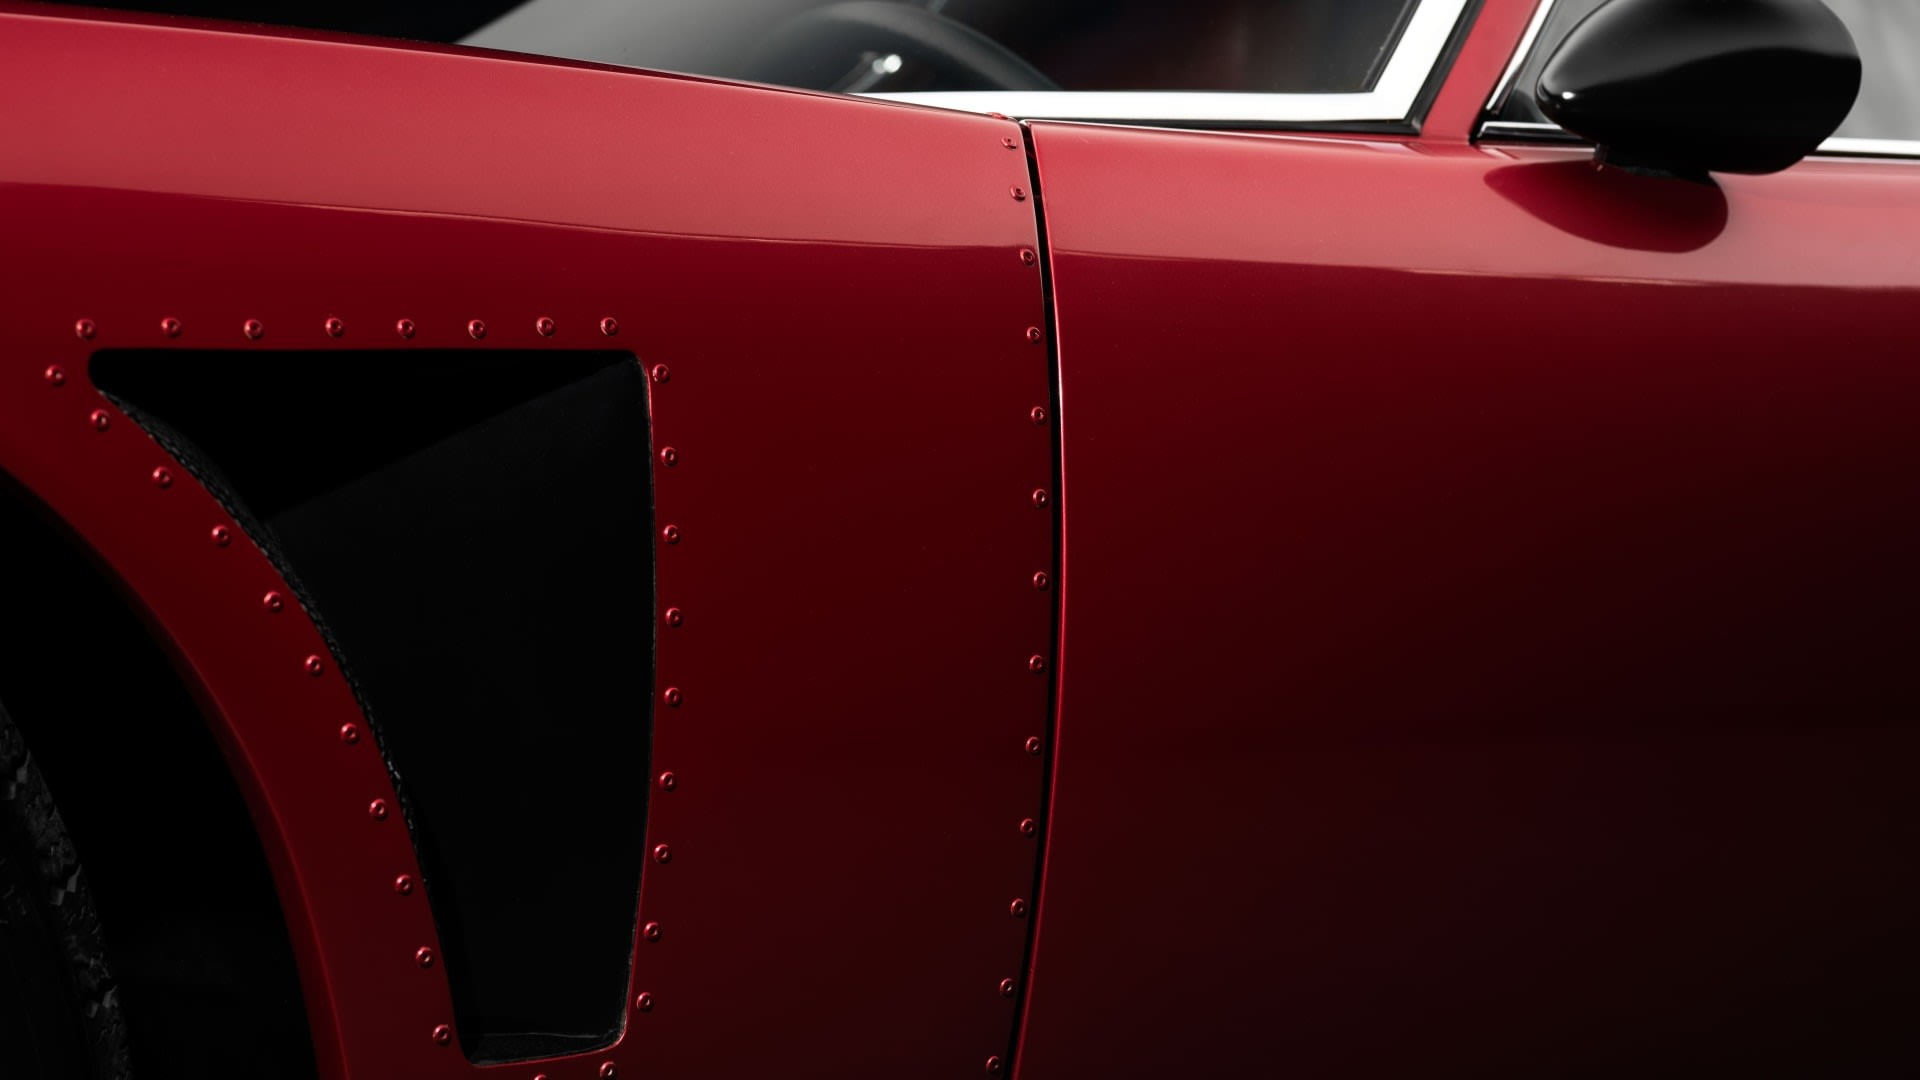 Lamborghini Miura SVJ 1972 года — один из трех выпущенных